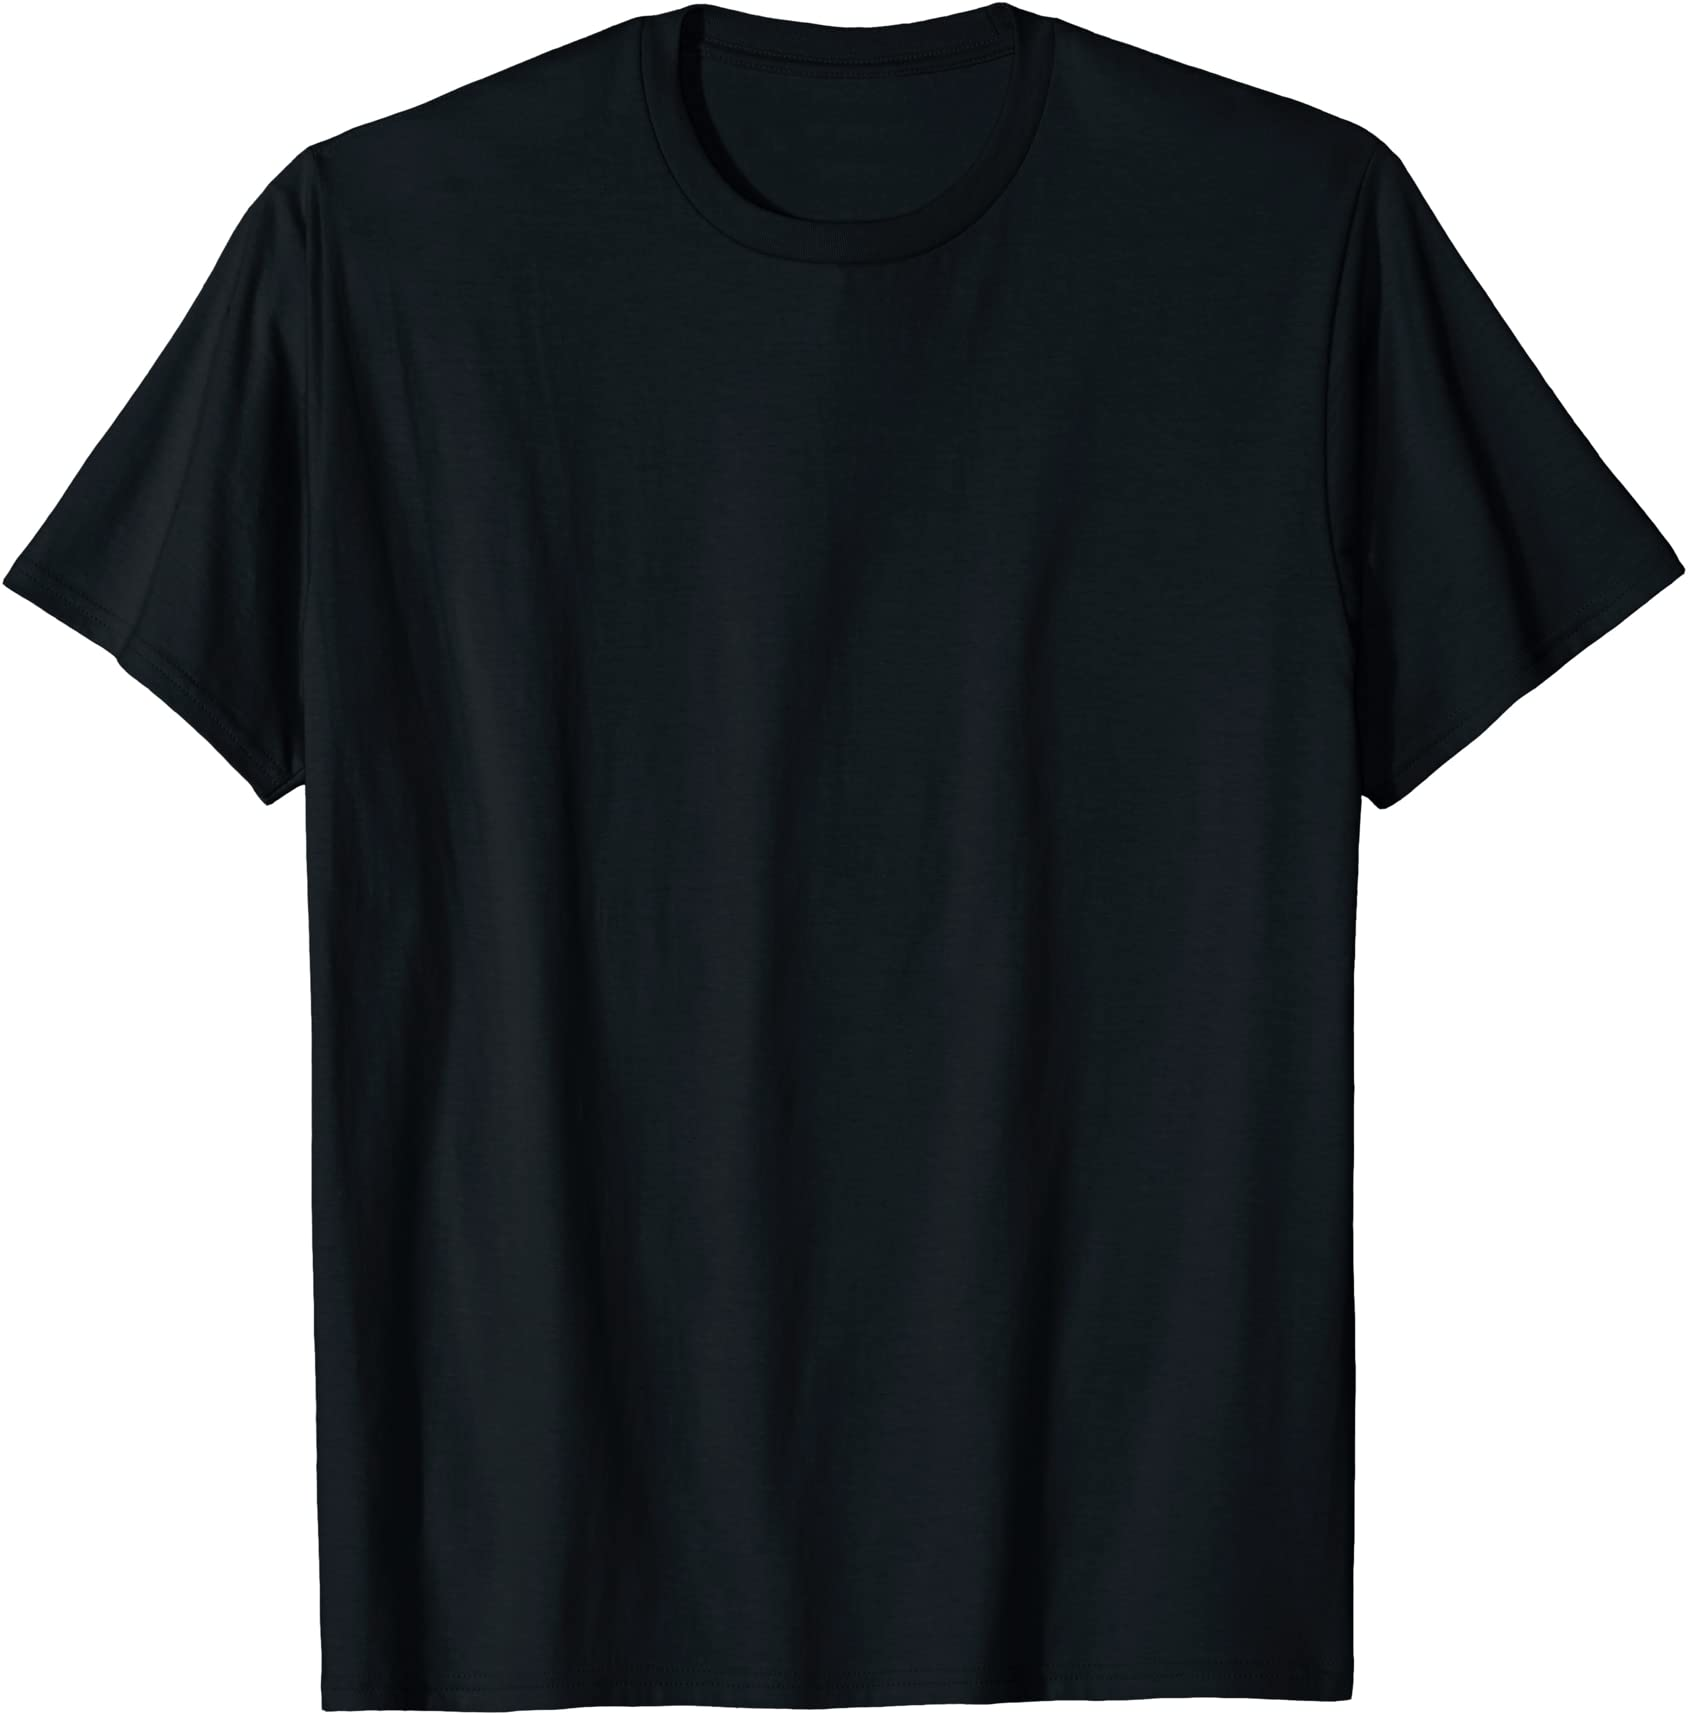 Tee Sweatshirt Funny Gift Birthday Awaesome Tee Funny Nursing Student Nurse Gift Idea Funny Unisex Tshirt